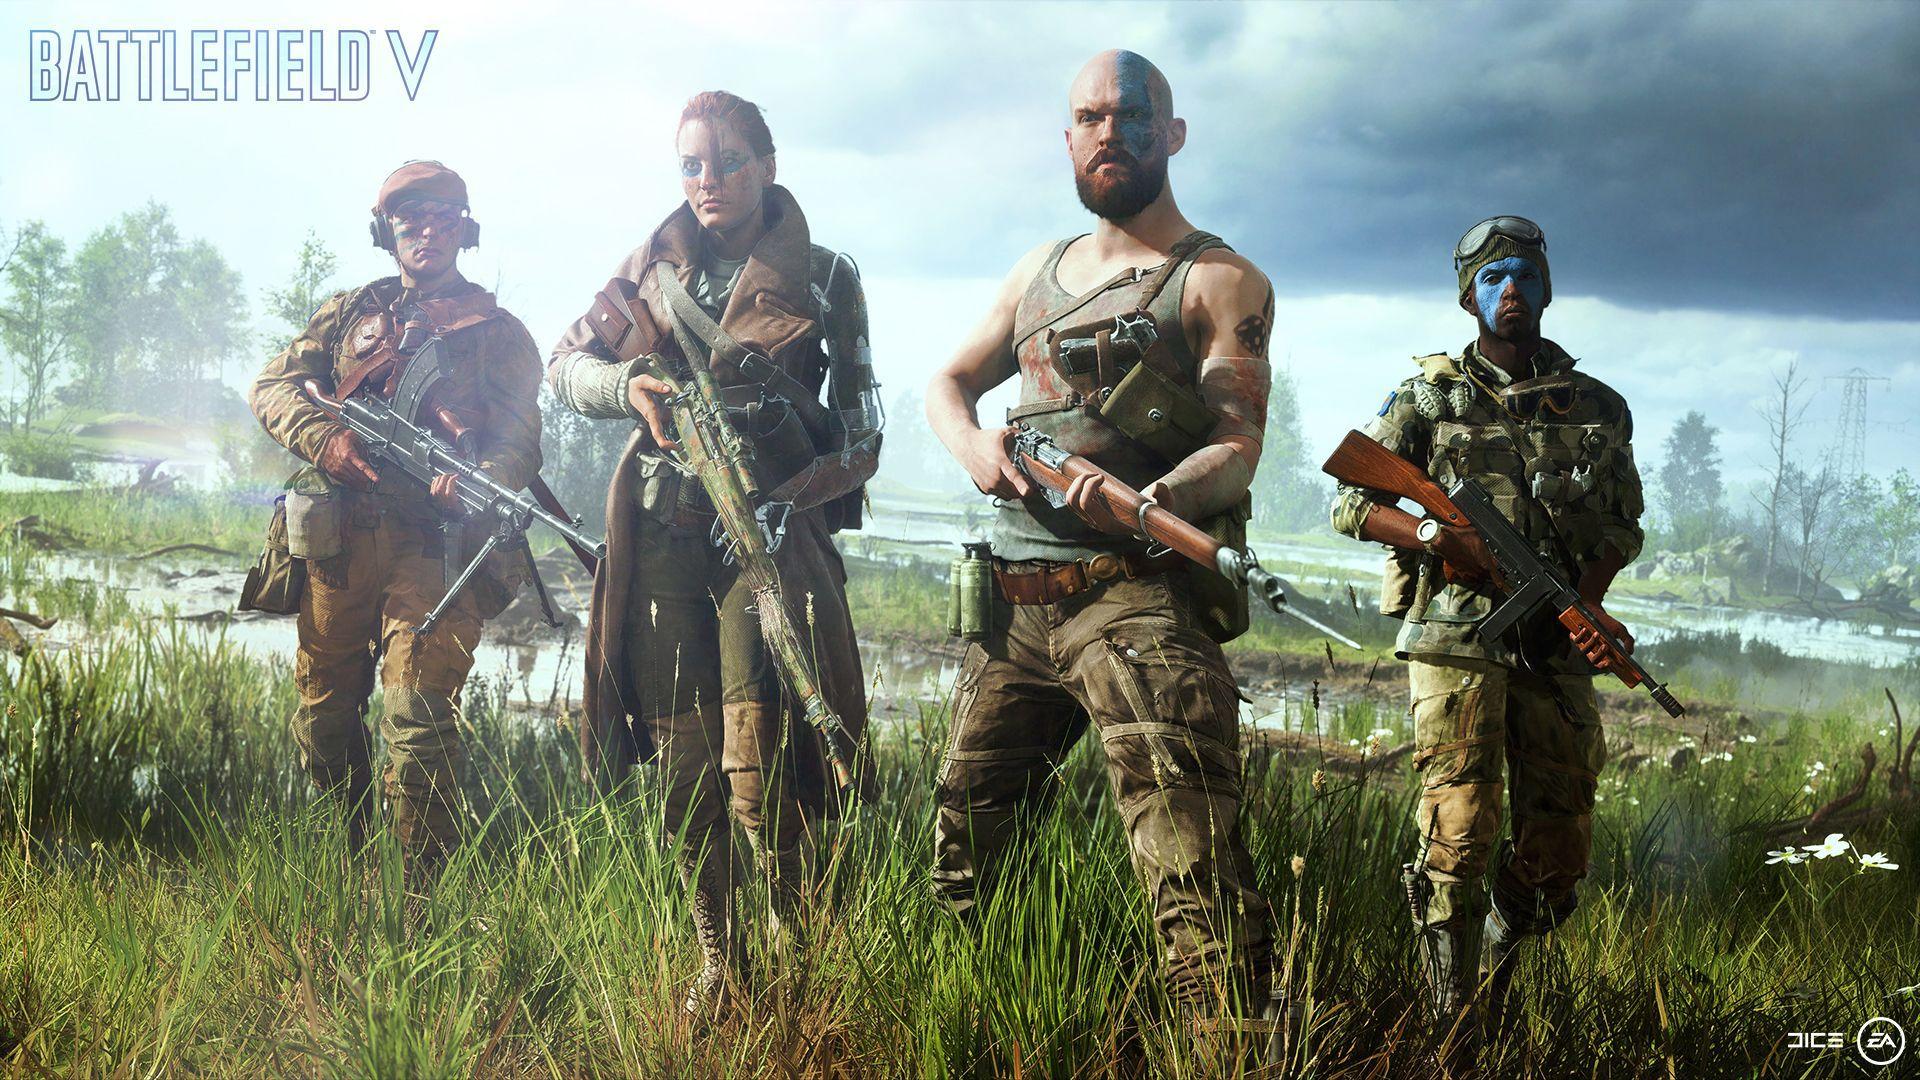 Battlefield V will have a Battle Royale Mode